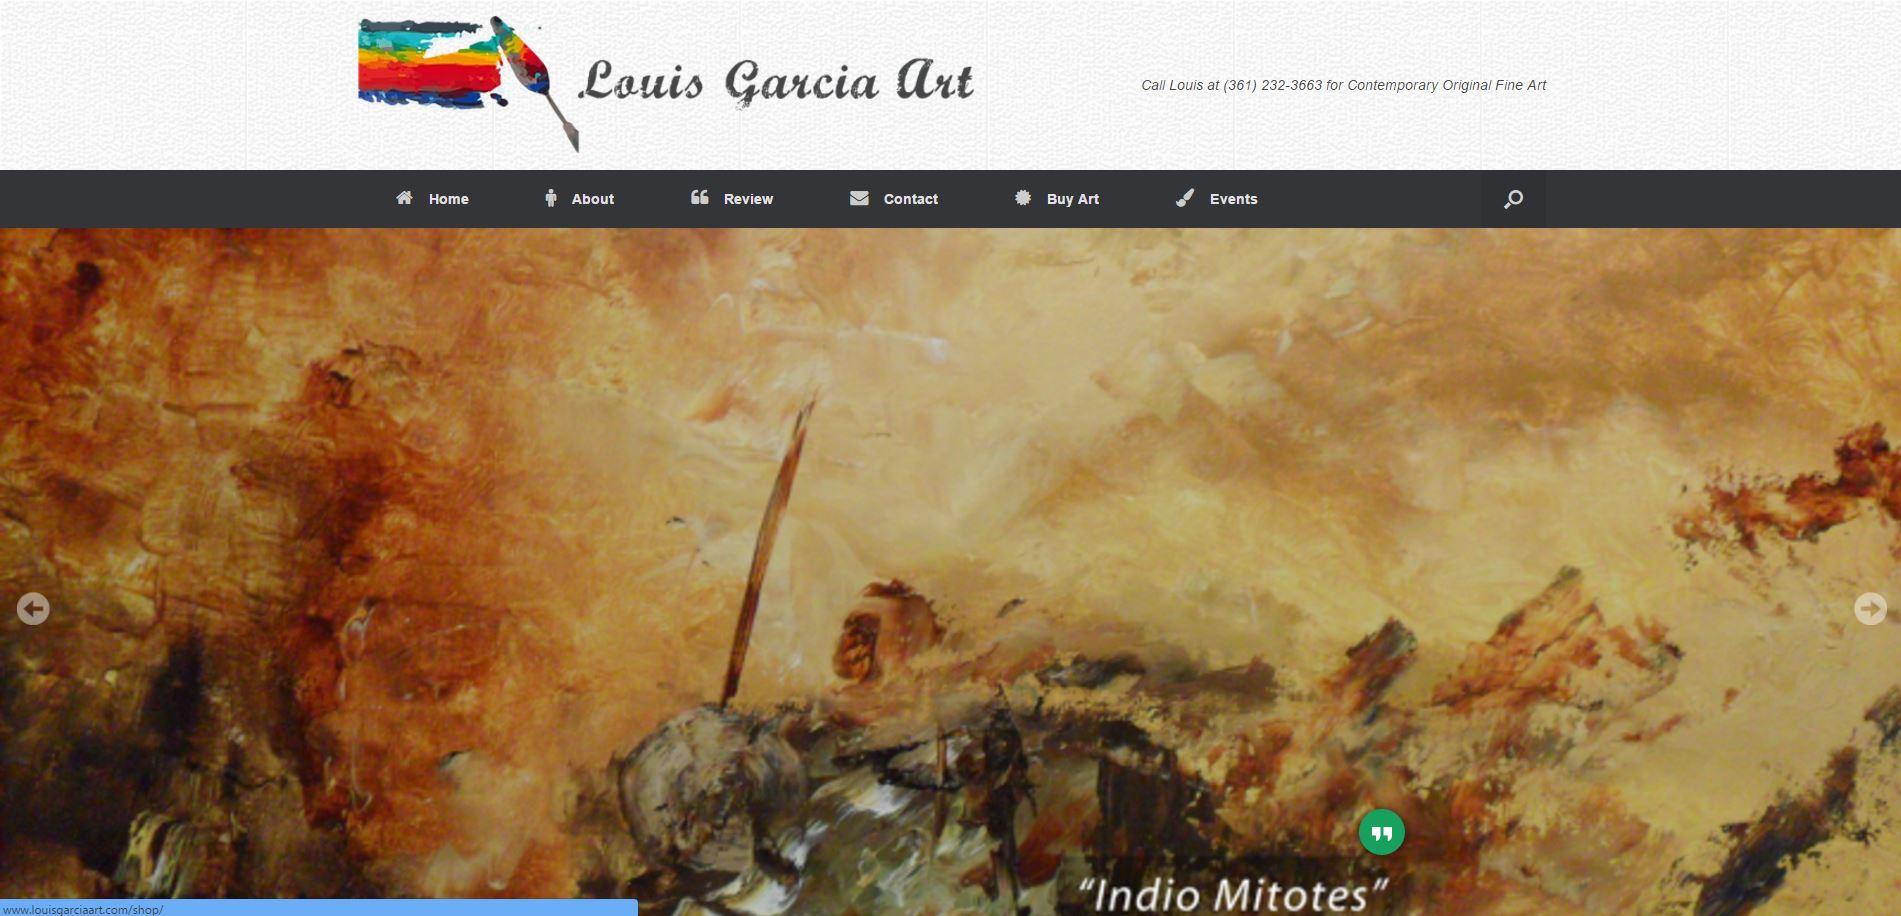 Louis Garcia Art